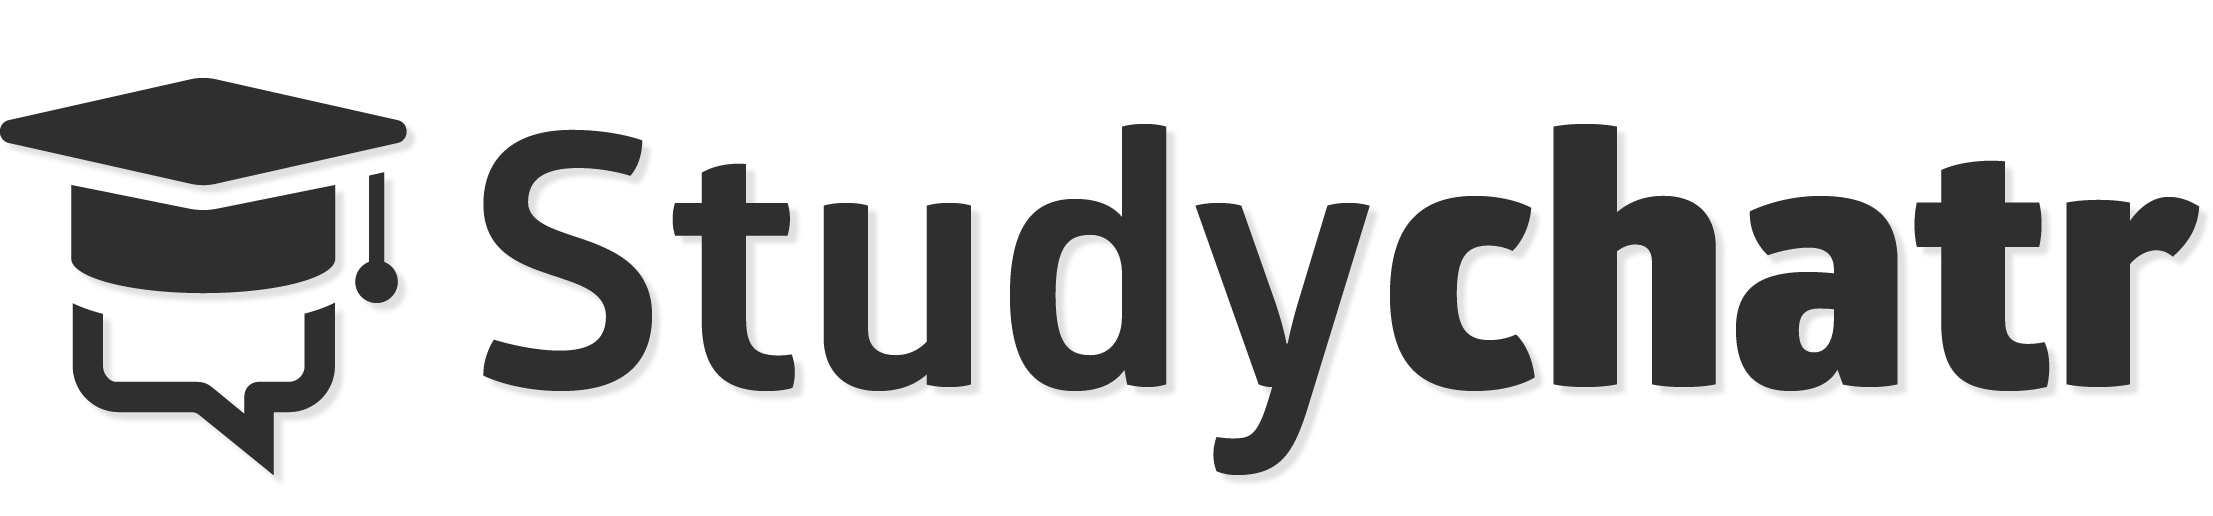 studychatr